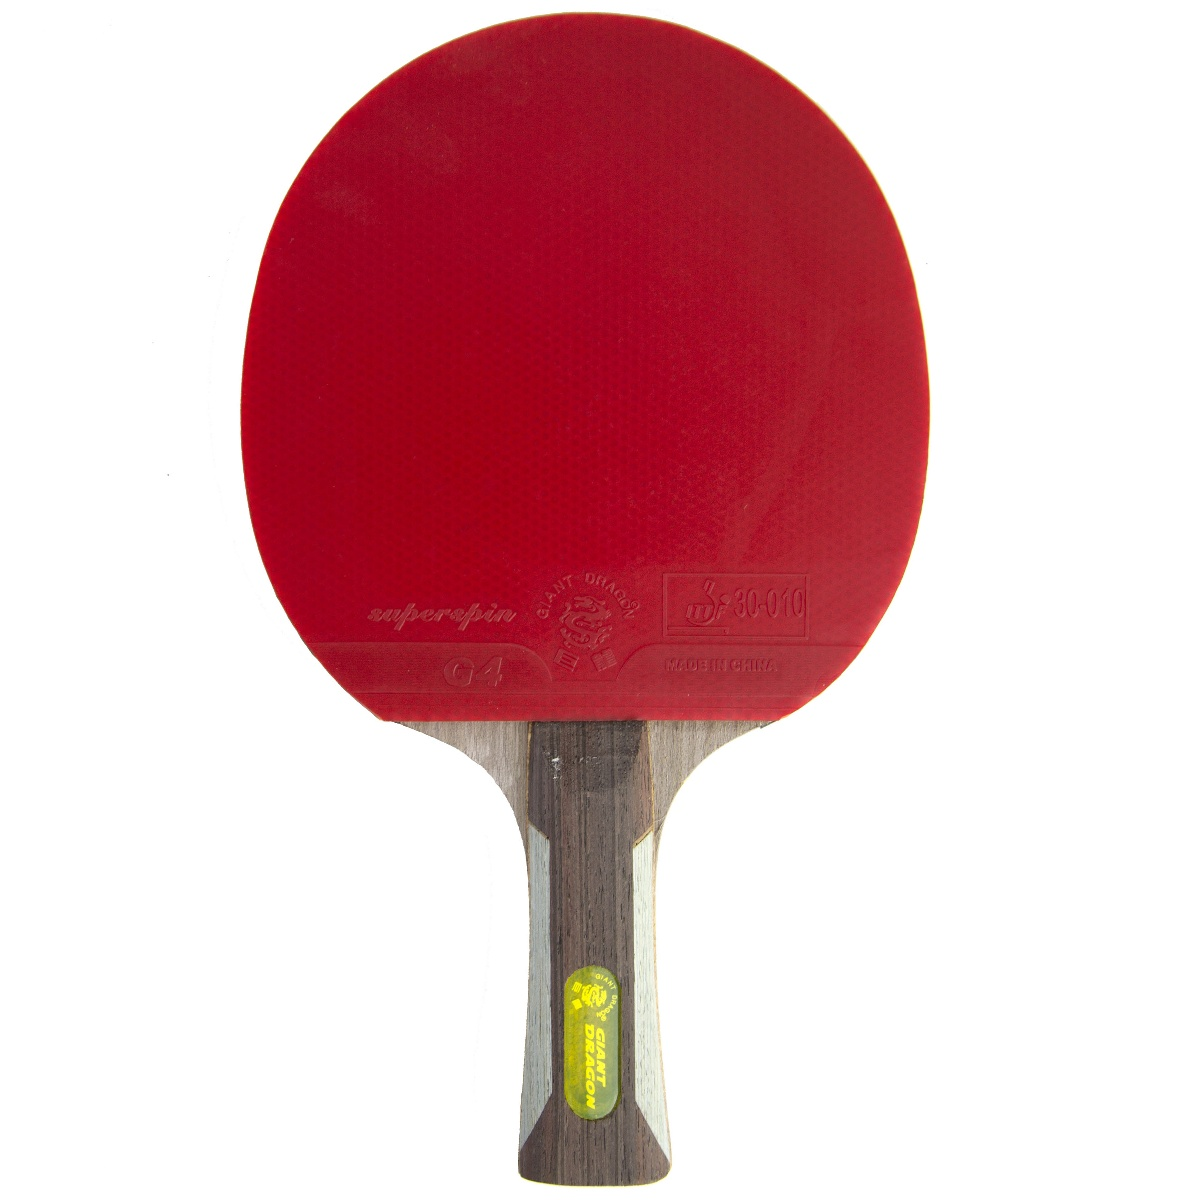 Pálka na stolní tenis ITTF Superspin 6*